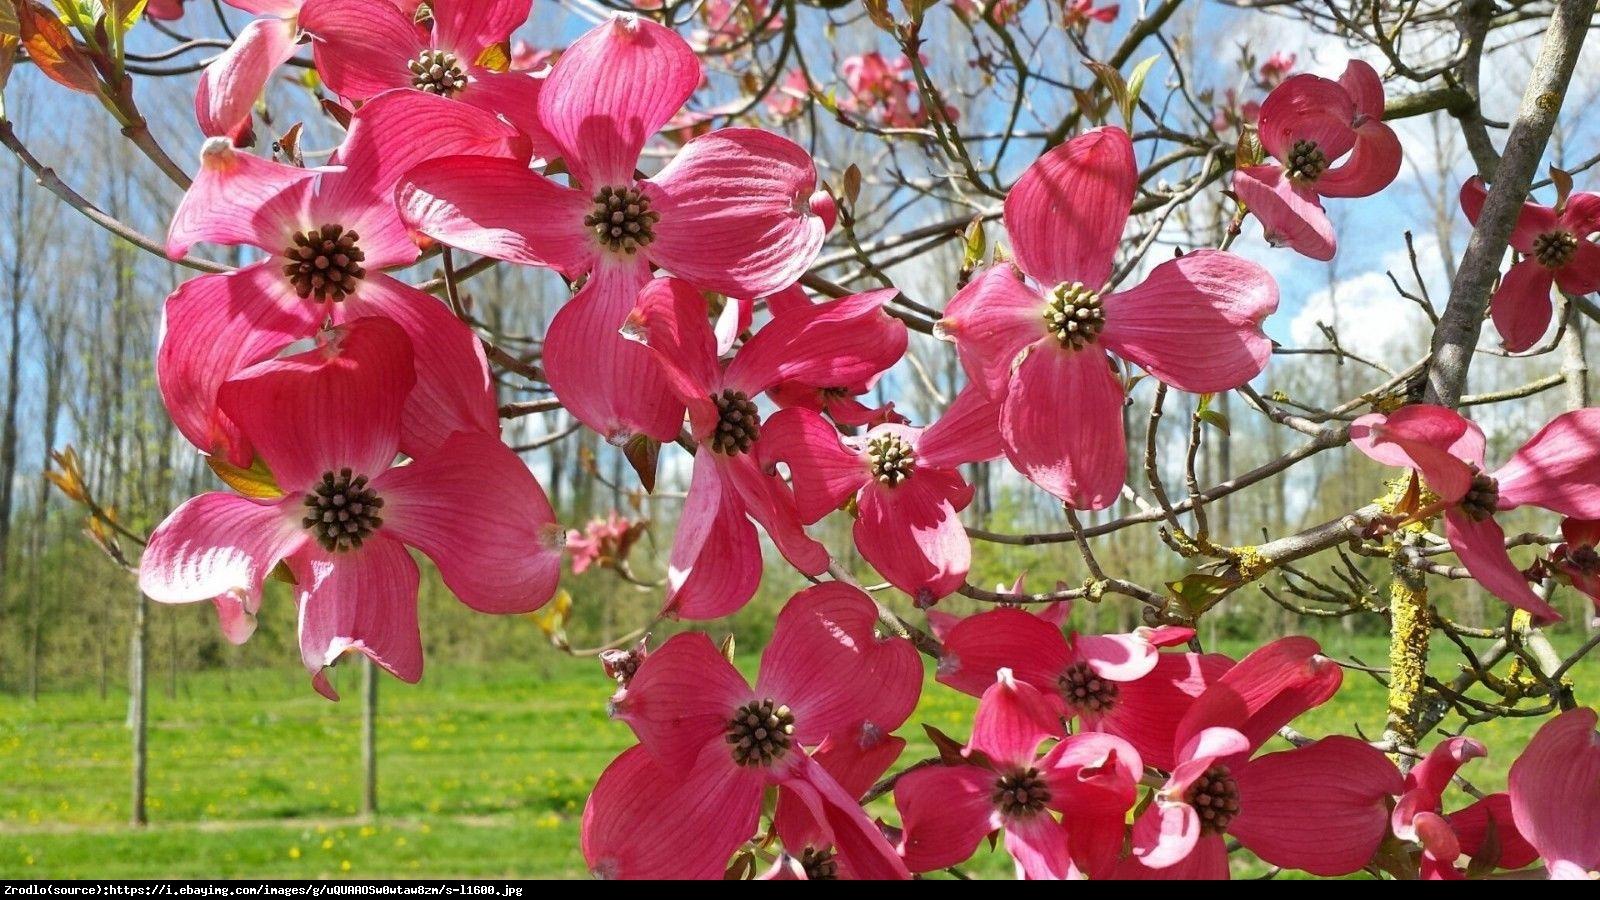 Dereń kwiecisty CHEROKEE CHIEF  - Cornus florida CHEROKEE CHIEF